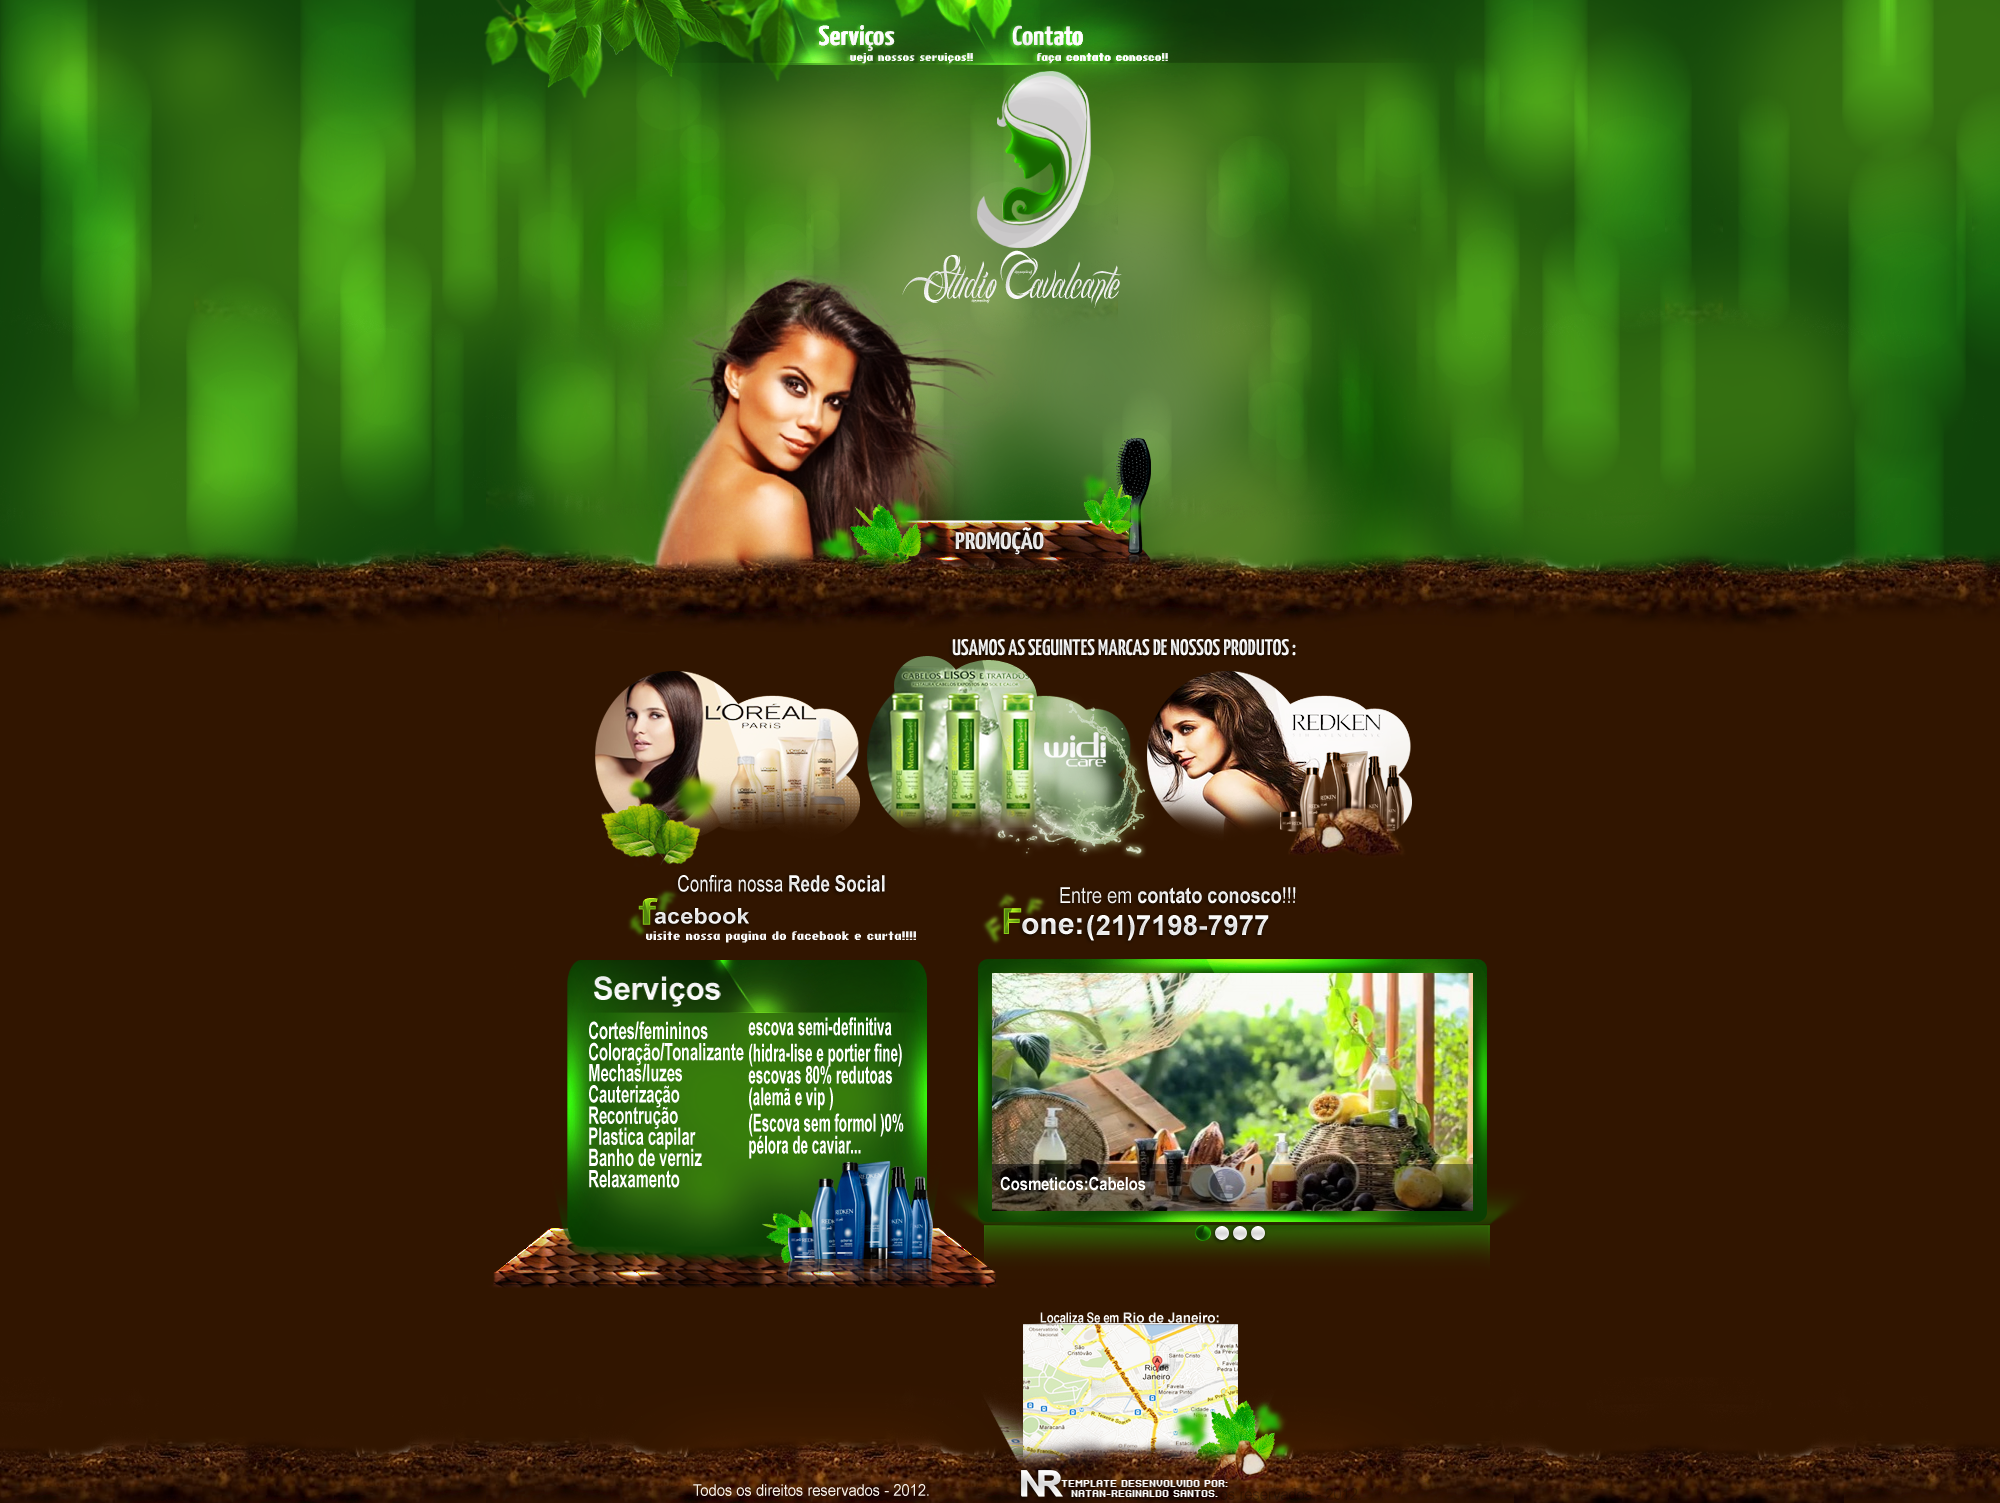 Studio Cavalcante by nr-design